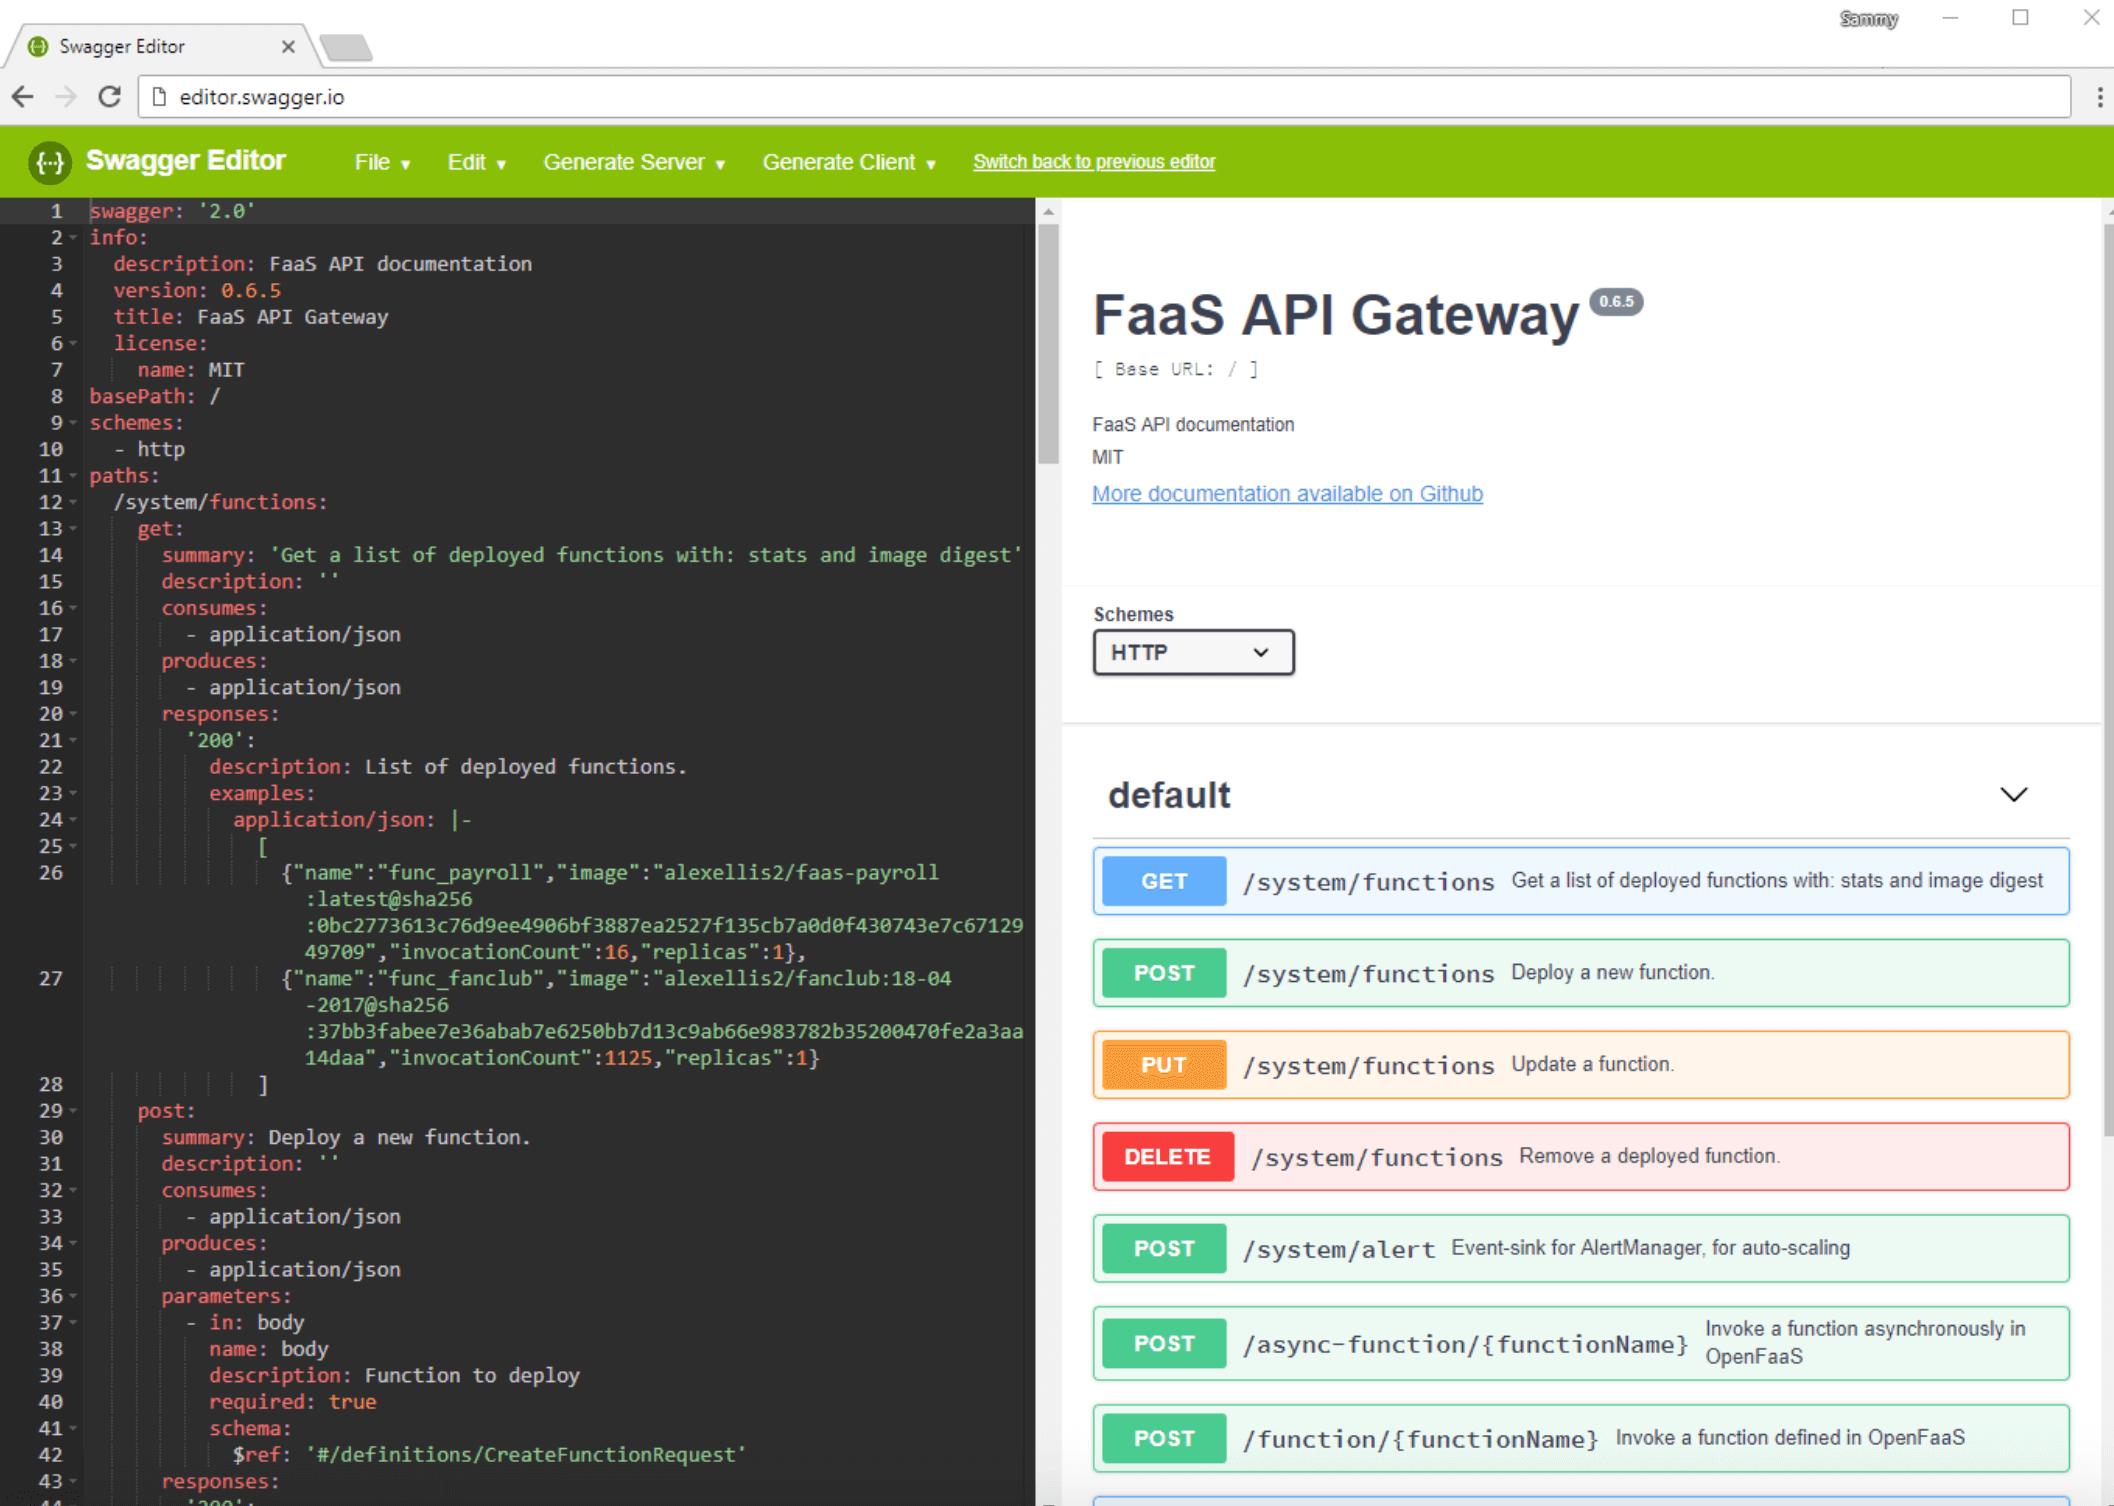 How To Install OpenFaaS with Docker Swarm on Ubuntu 16 04 | DigitalOcean